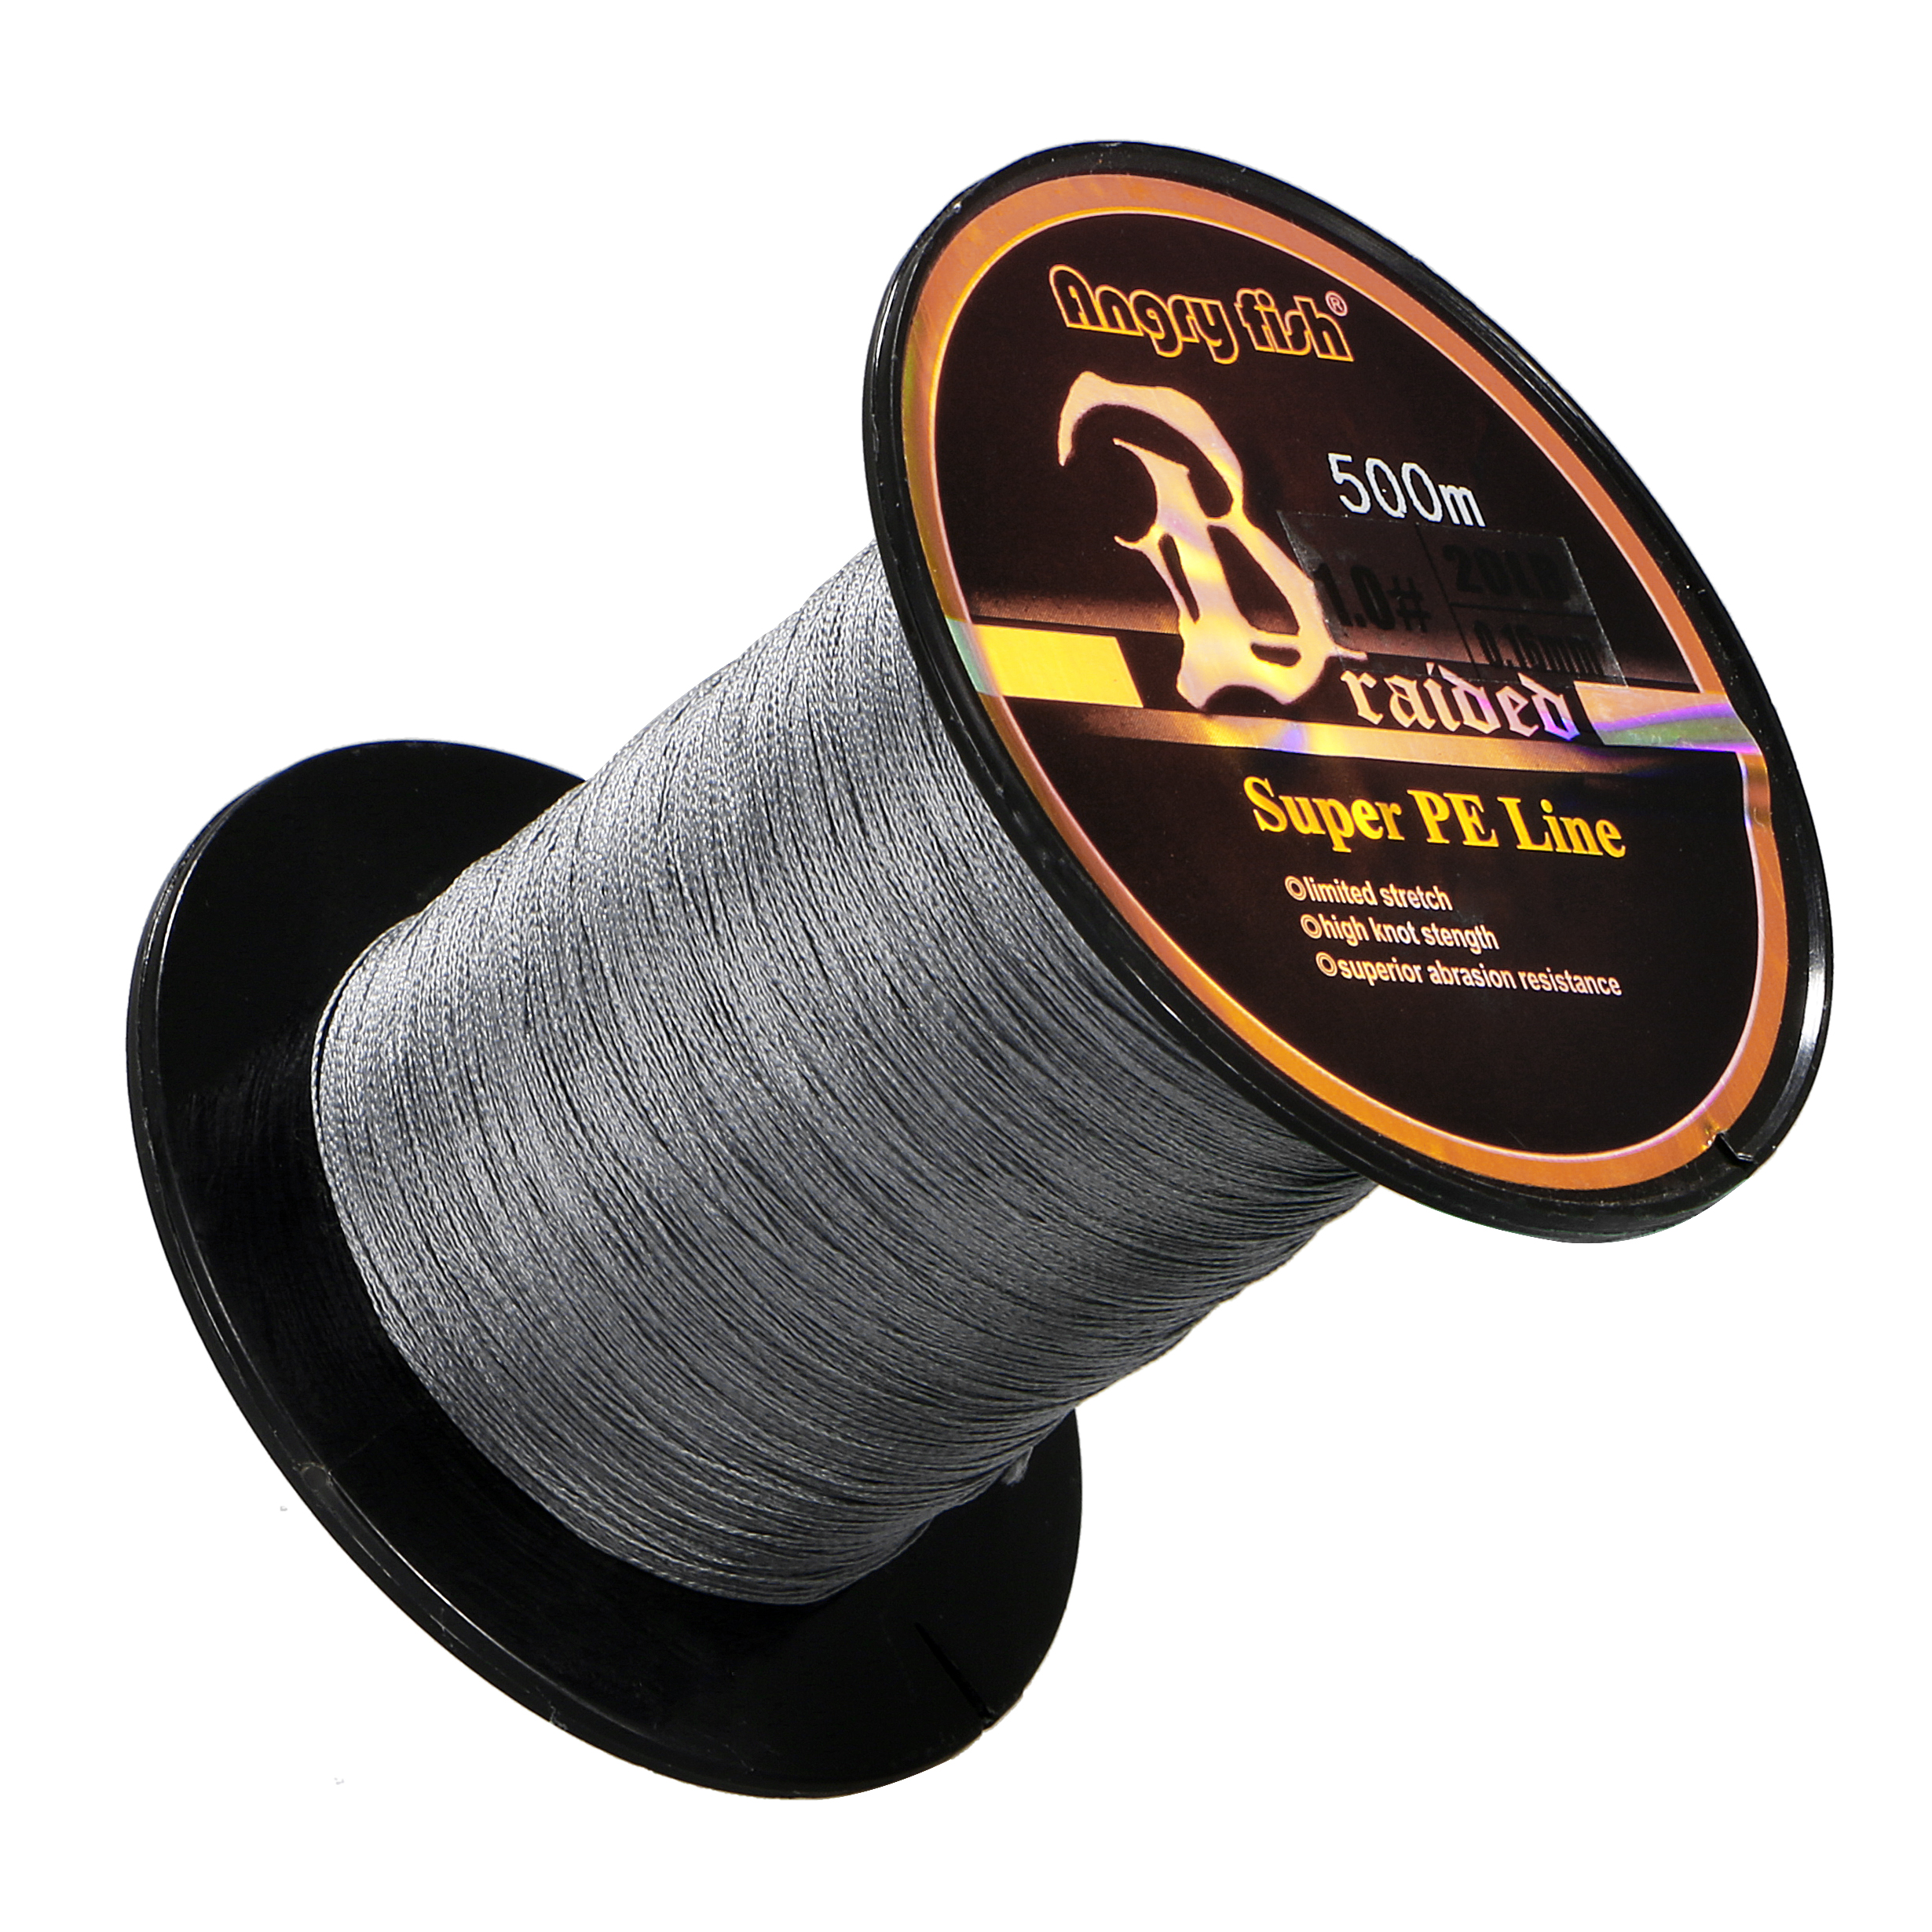 TSV PE Fishing Line String 500M 4 Strand Spectra Dyneema Braid Abrasion Resistant by